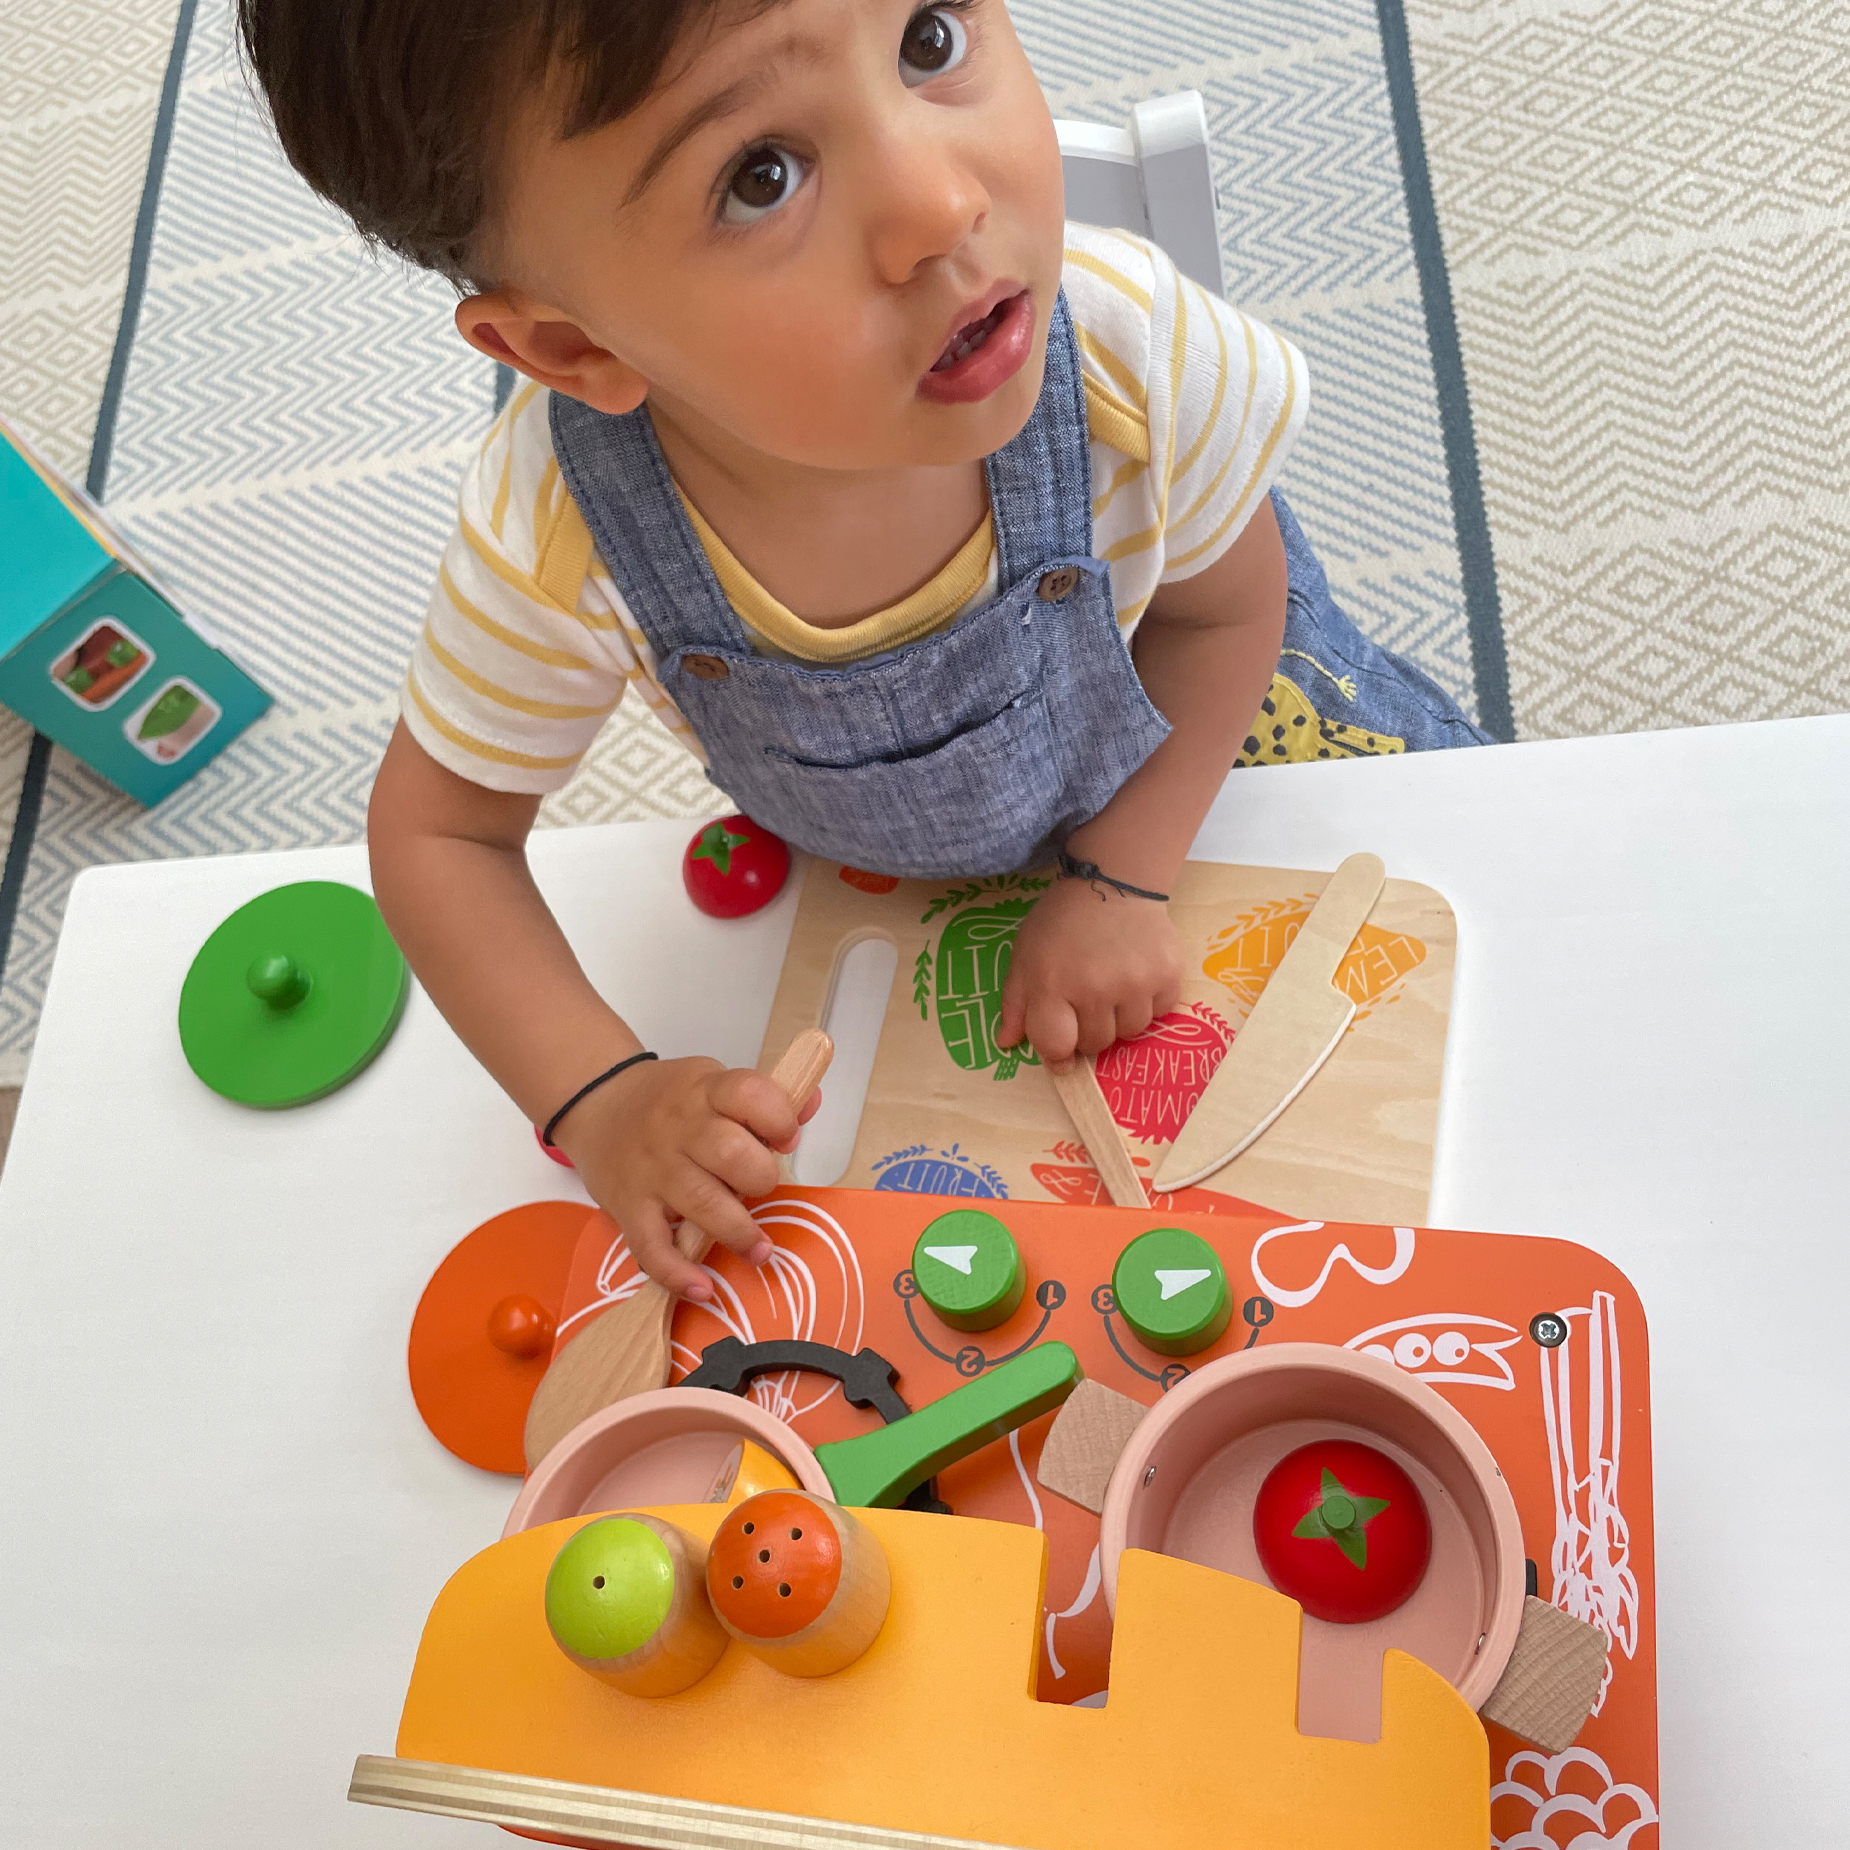 Wooden Kitchen Set for 3+ years Kids